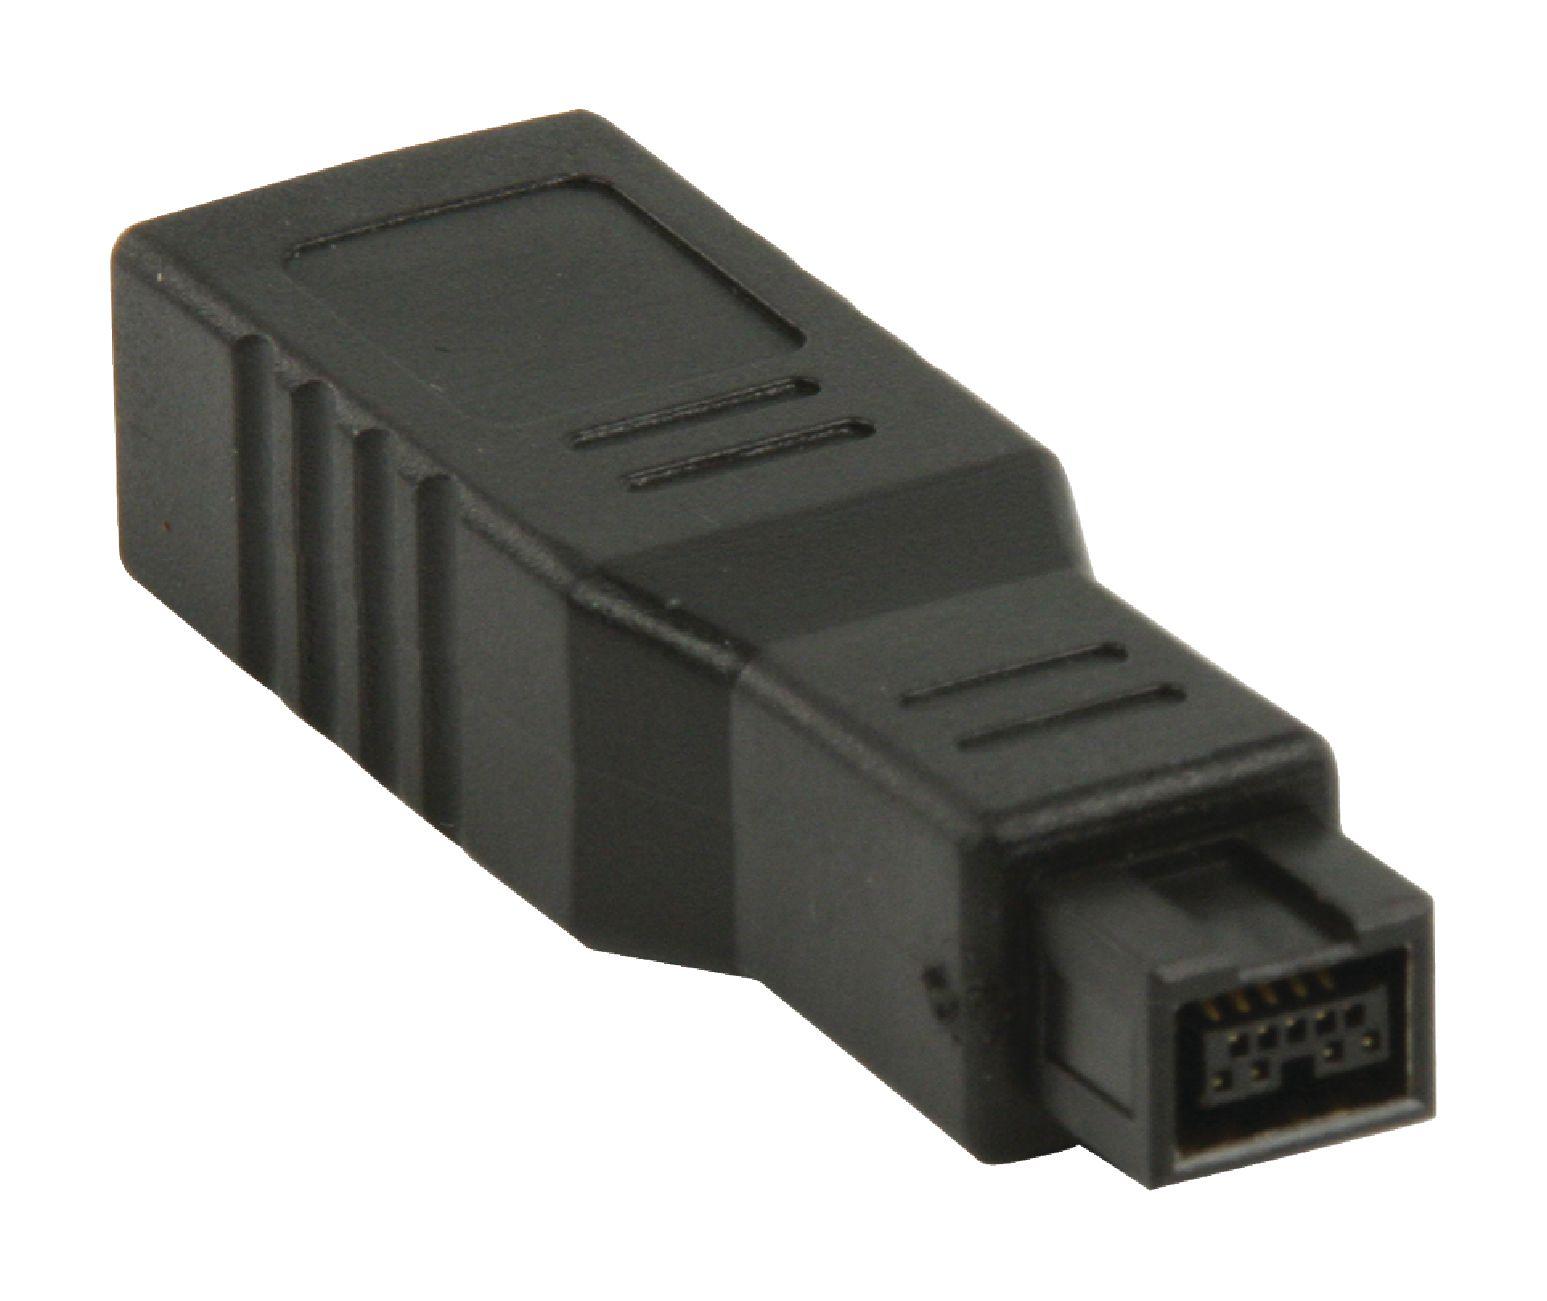 VLCP62905B - Valueline - FireWire 400 Adapter FireWire 9-Pin Male ...